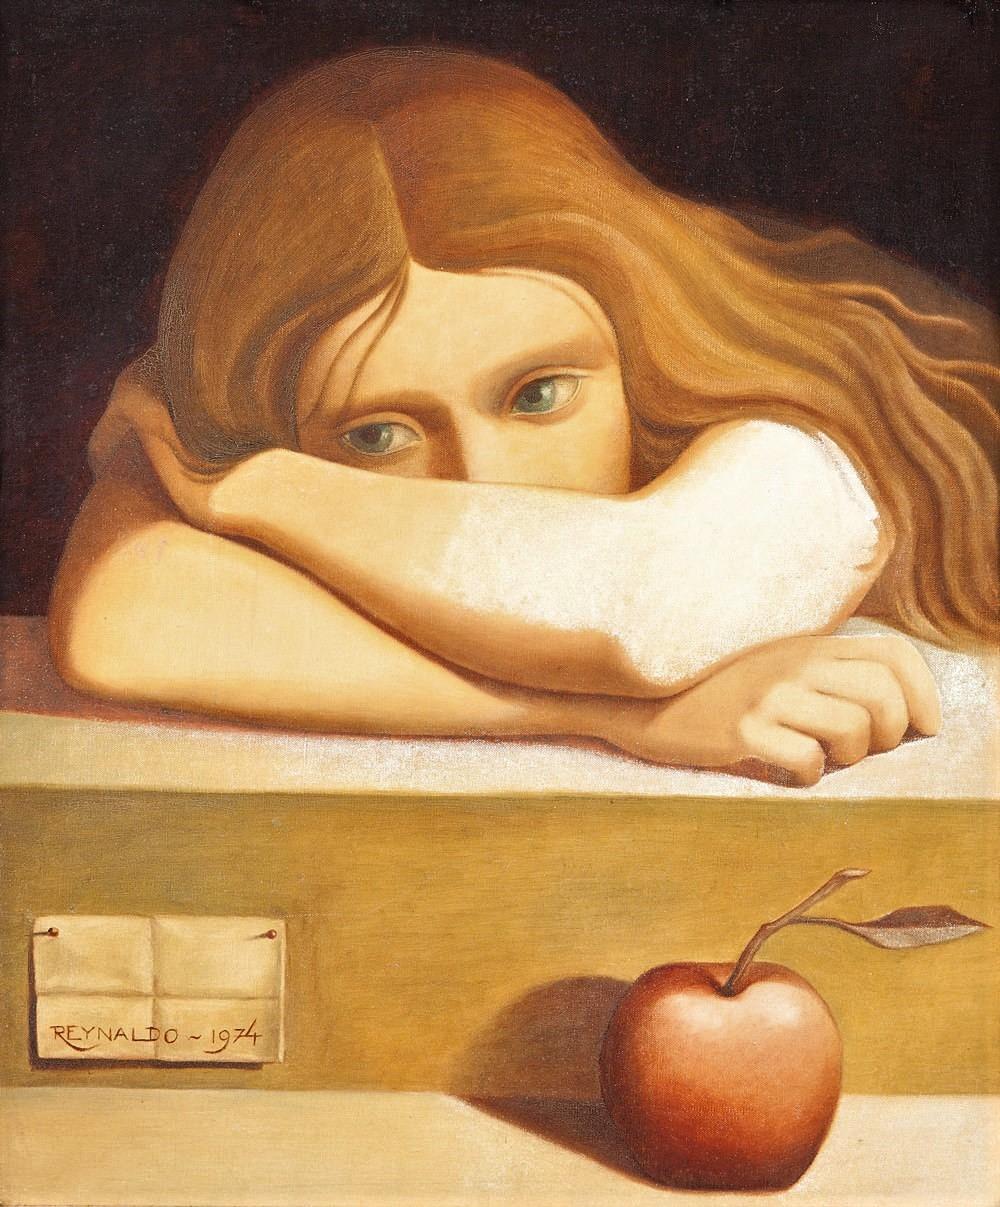 Reynaldo Fonseca (Brasil, 1925) Menina com Maça,1974,75 x 60 cm,óleo sobre tela